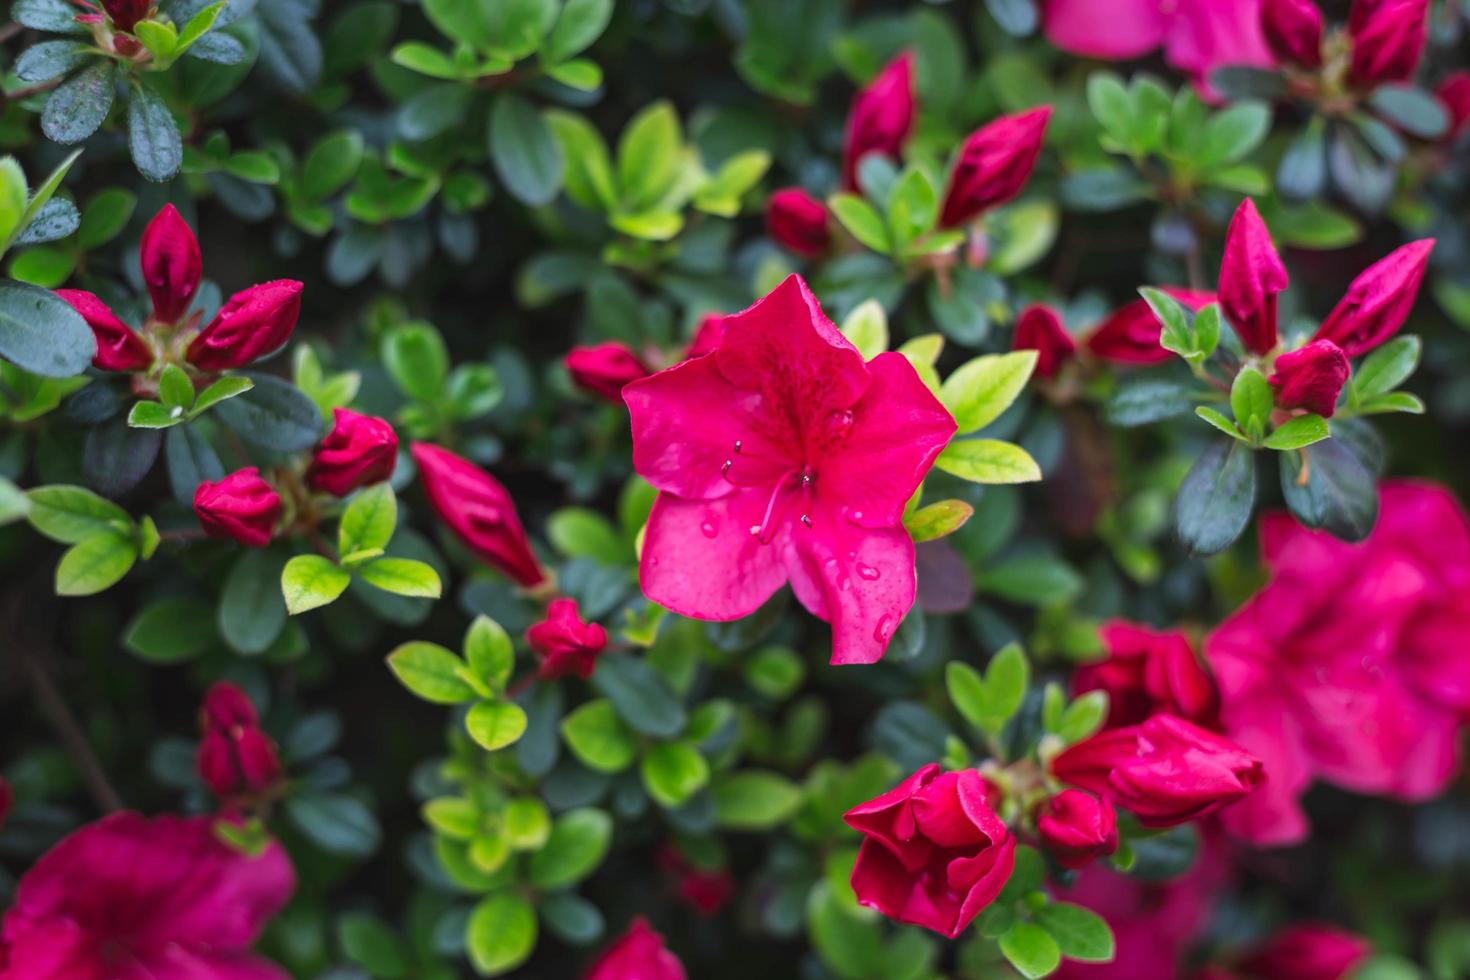 primer plano, de, un, flor roja, florecer foto